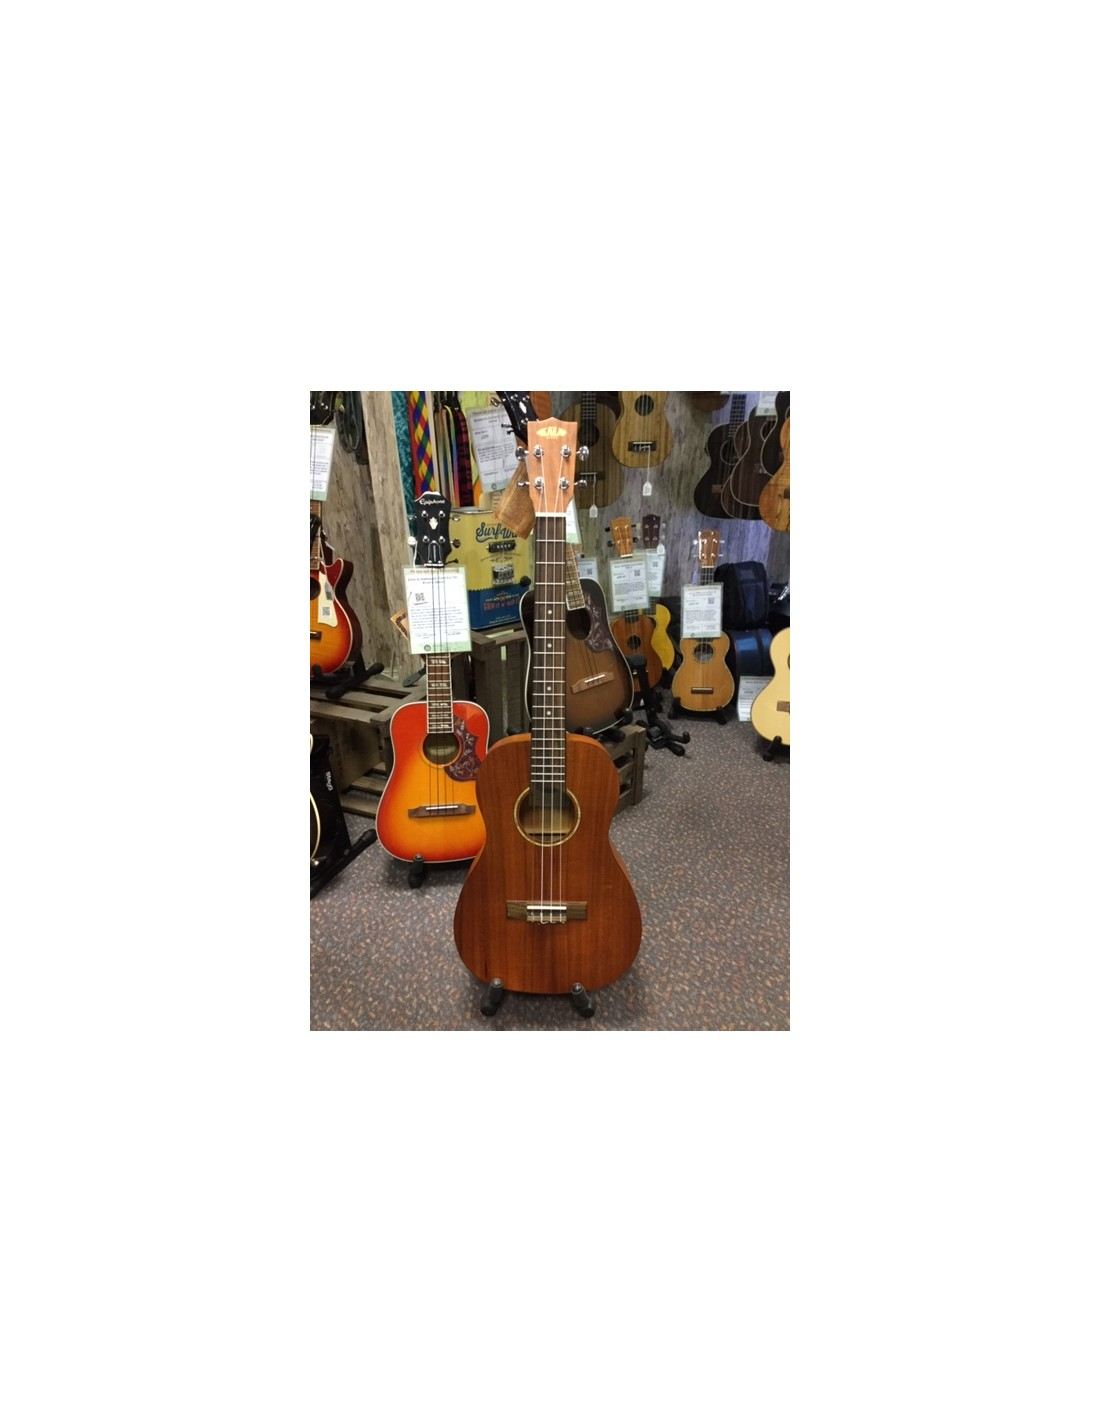 kala ka gab golden acacia baritone ukulele re sale good condition. Black Bedroom Furniture Sets. Home Design Ideas